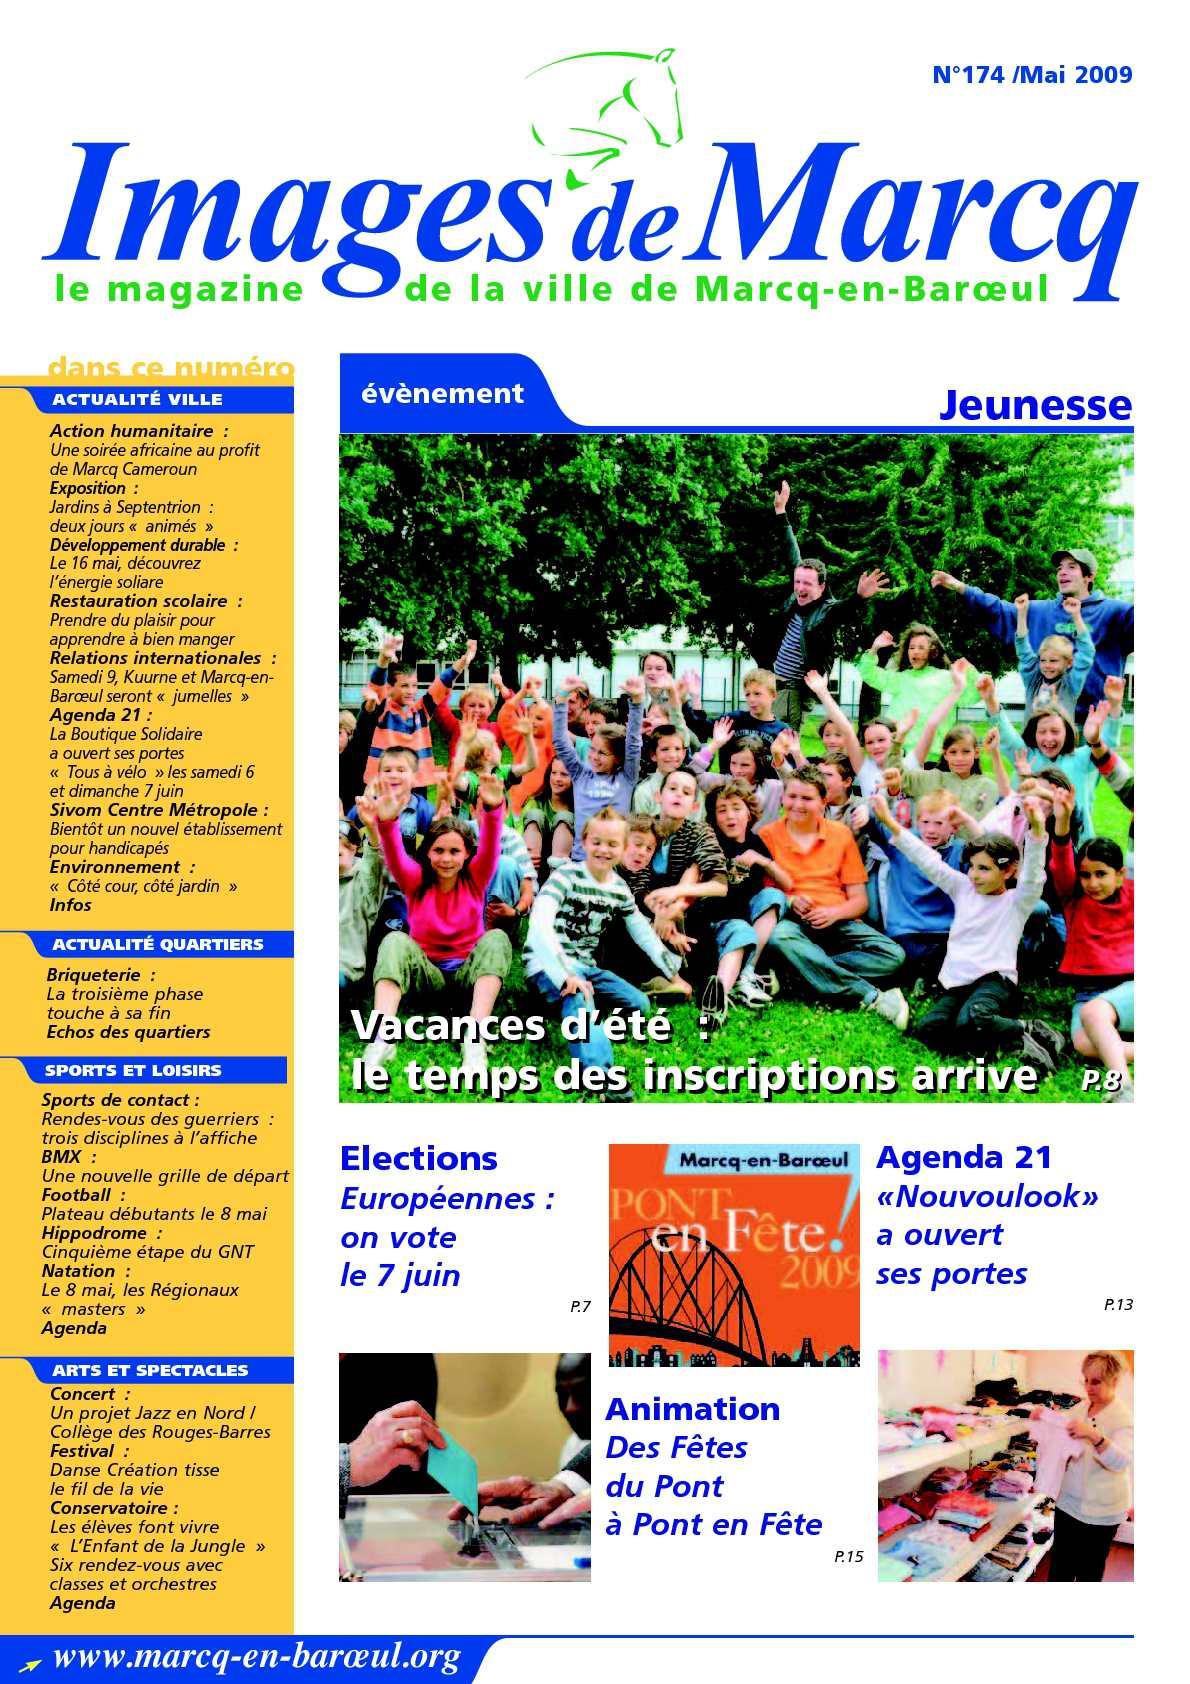 Calameo Images De Marcq N 174 Mai 2009 Journal Municipal De La